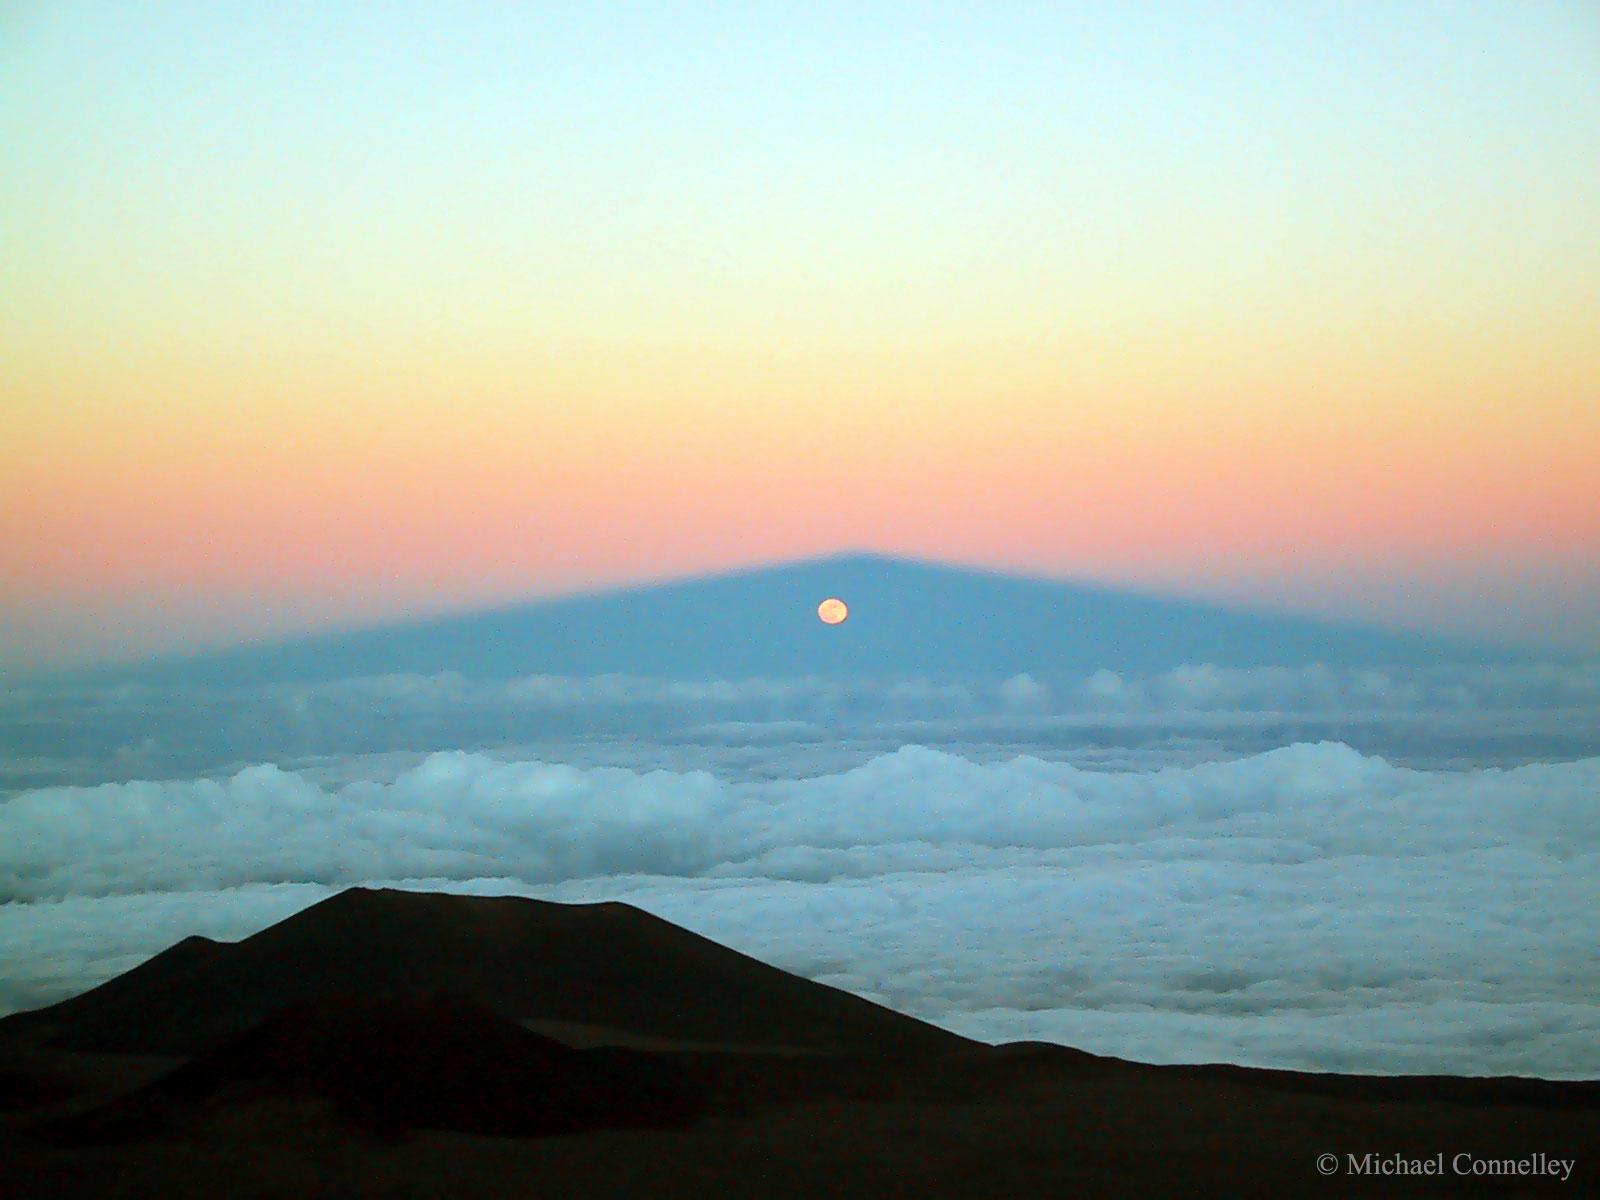 APOD: 2019 March 10 - Moonrise Through Mauna Kea's Shadow